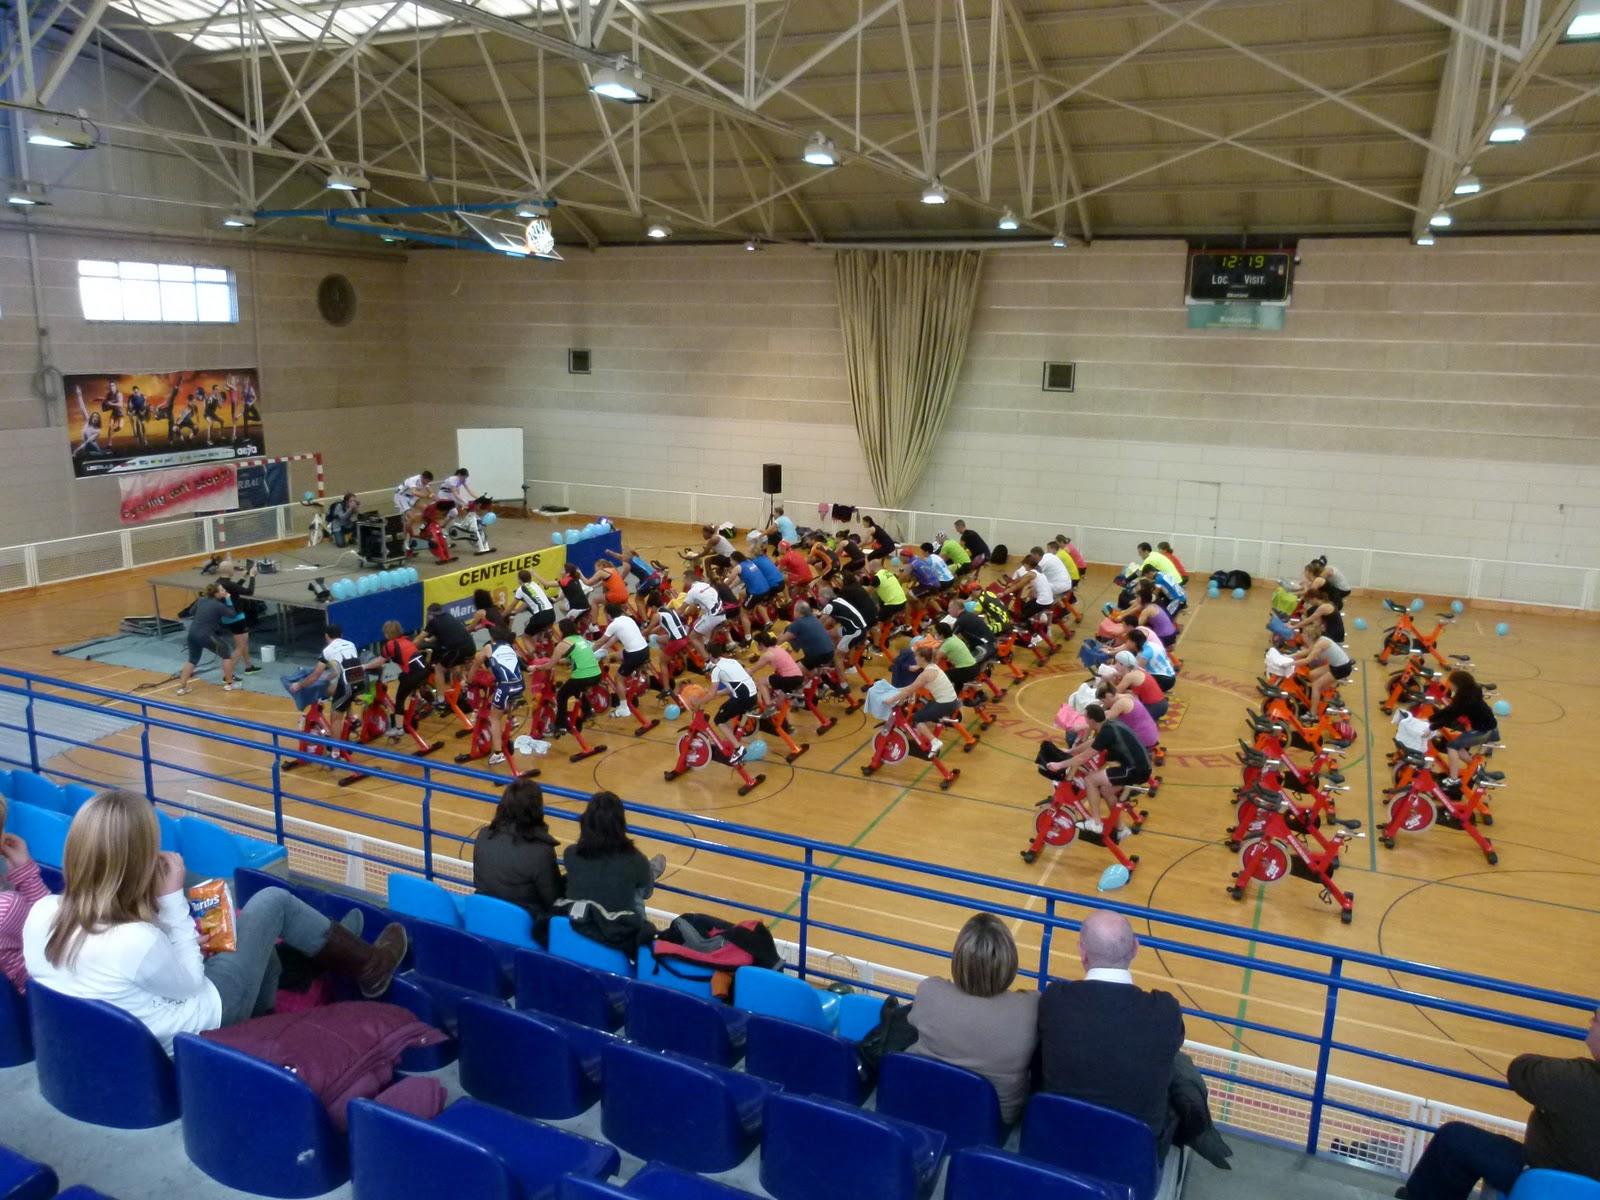 Osona rutes marato de centelles piscina municipal for Piscina municipal centelles